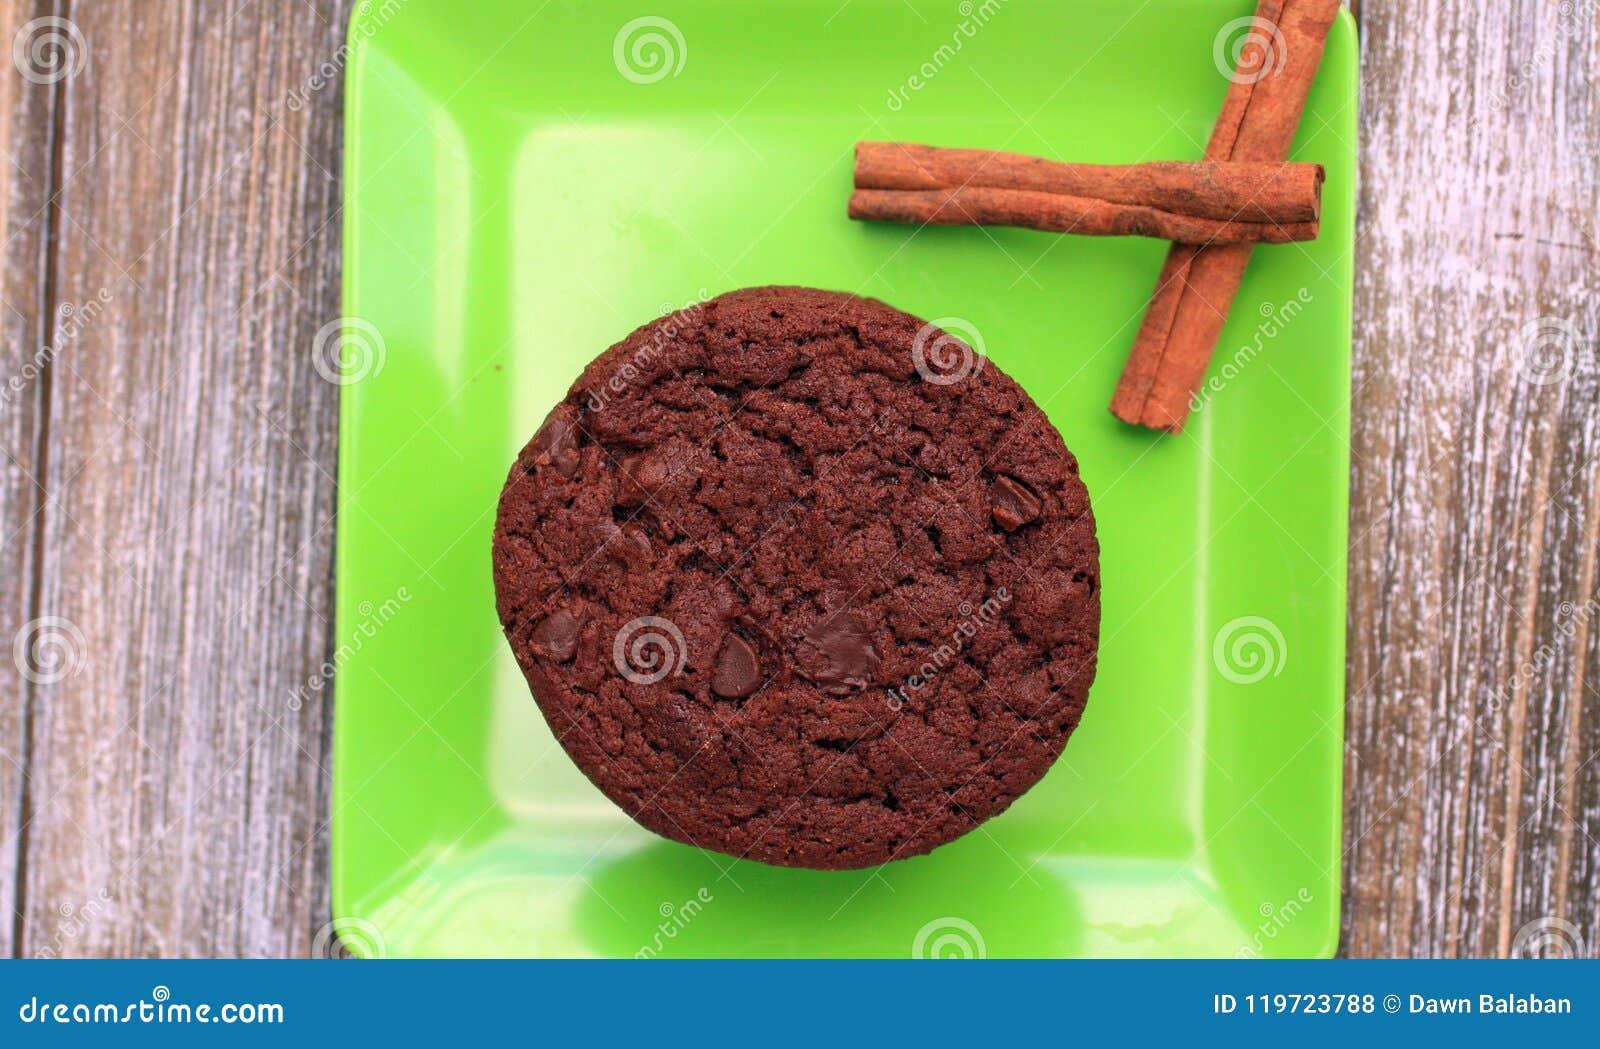 Top View Of Chocolate Chocolate Chip Star Cinnamon Sticks Chocolate